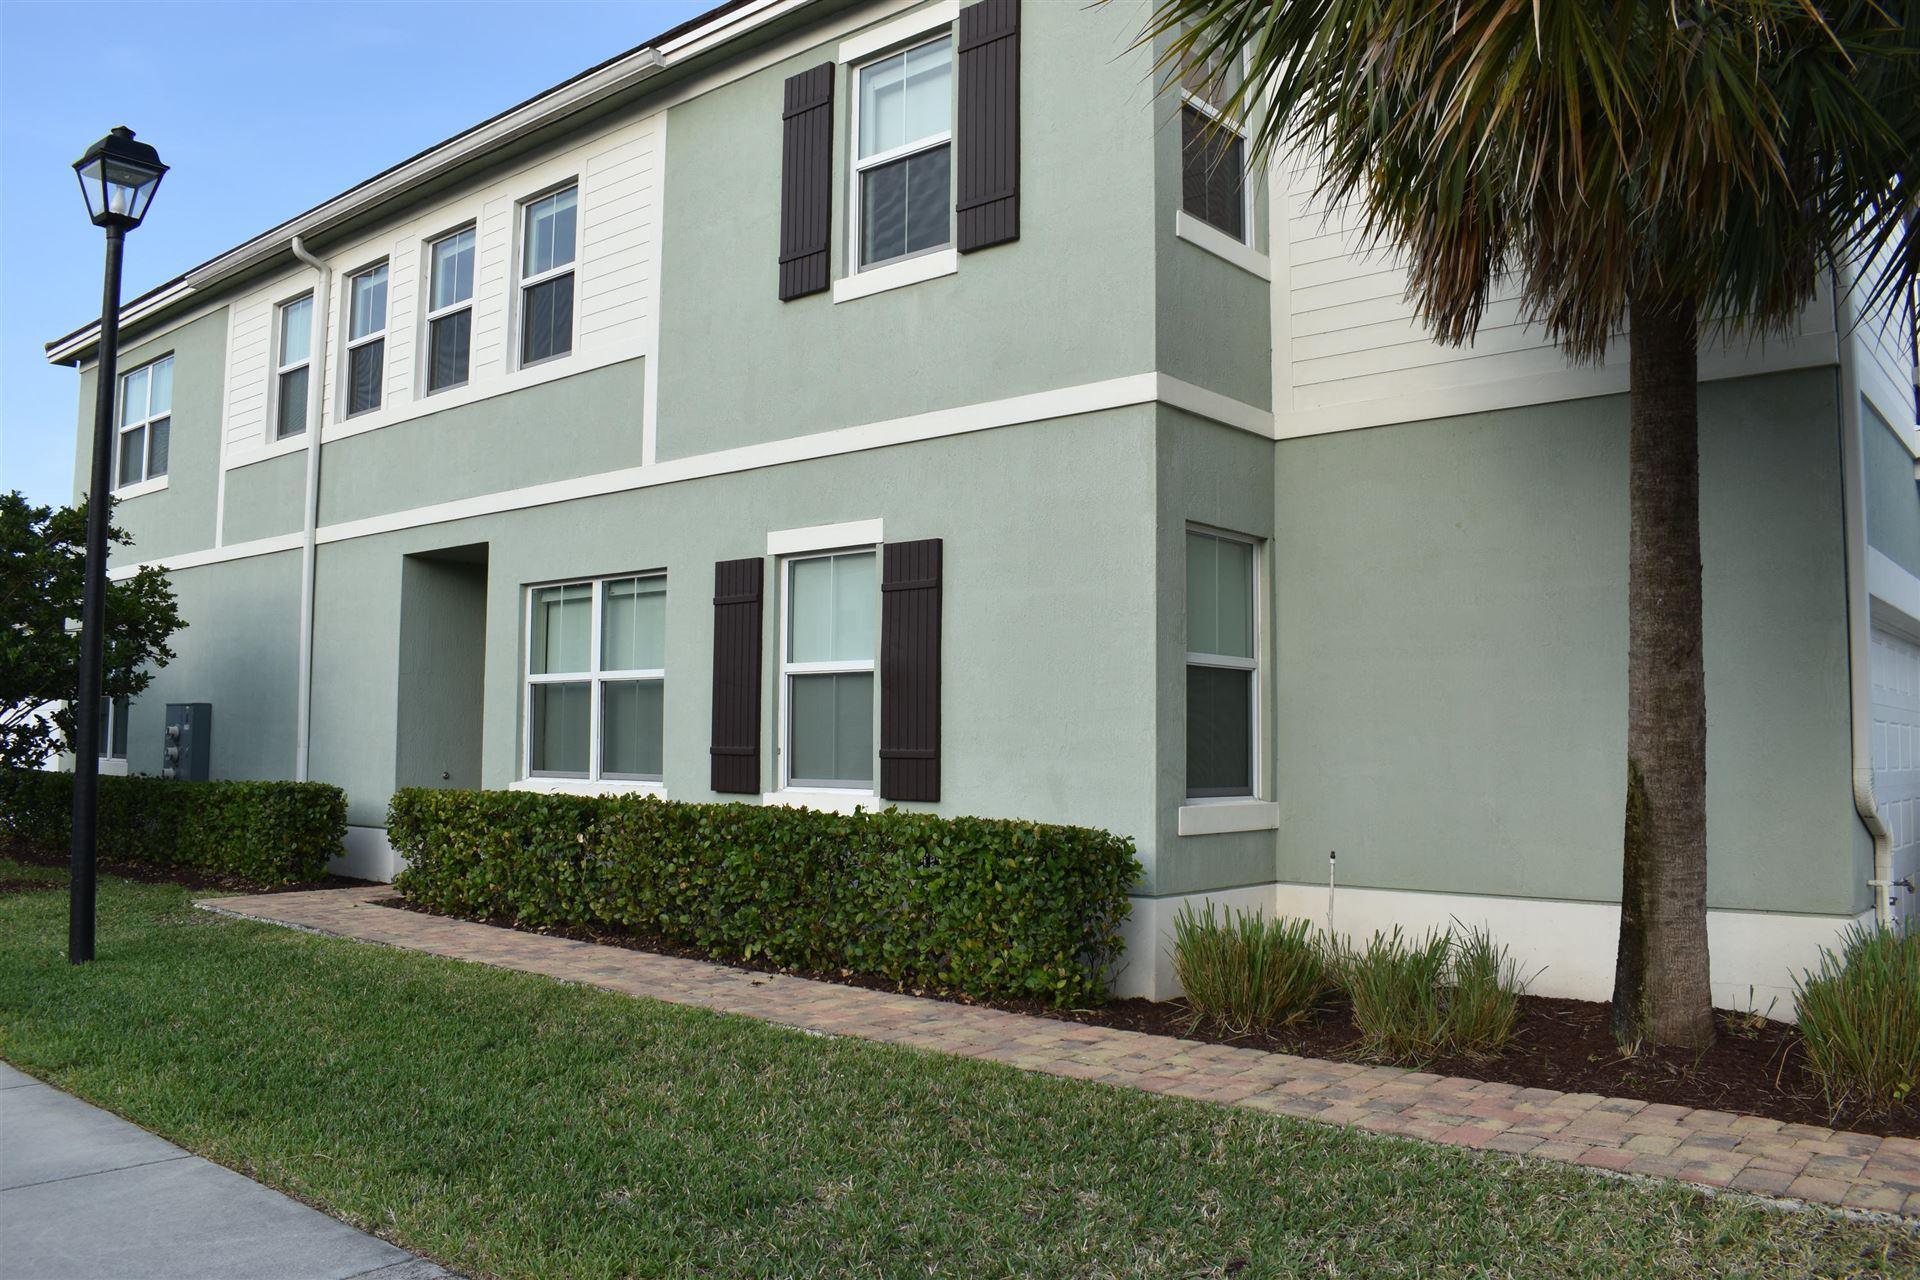 11977 Park Central, Royal Palm Beach, FL 33411 - #: RX-10700037